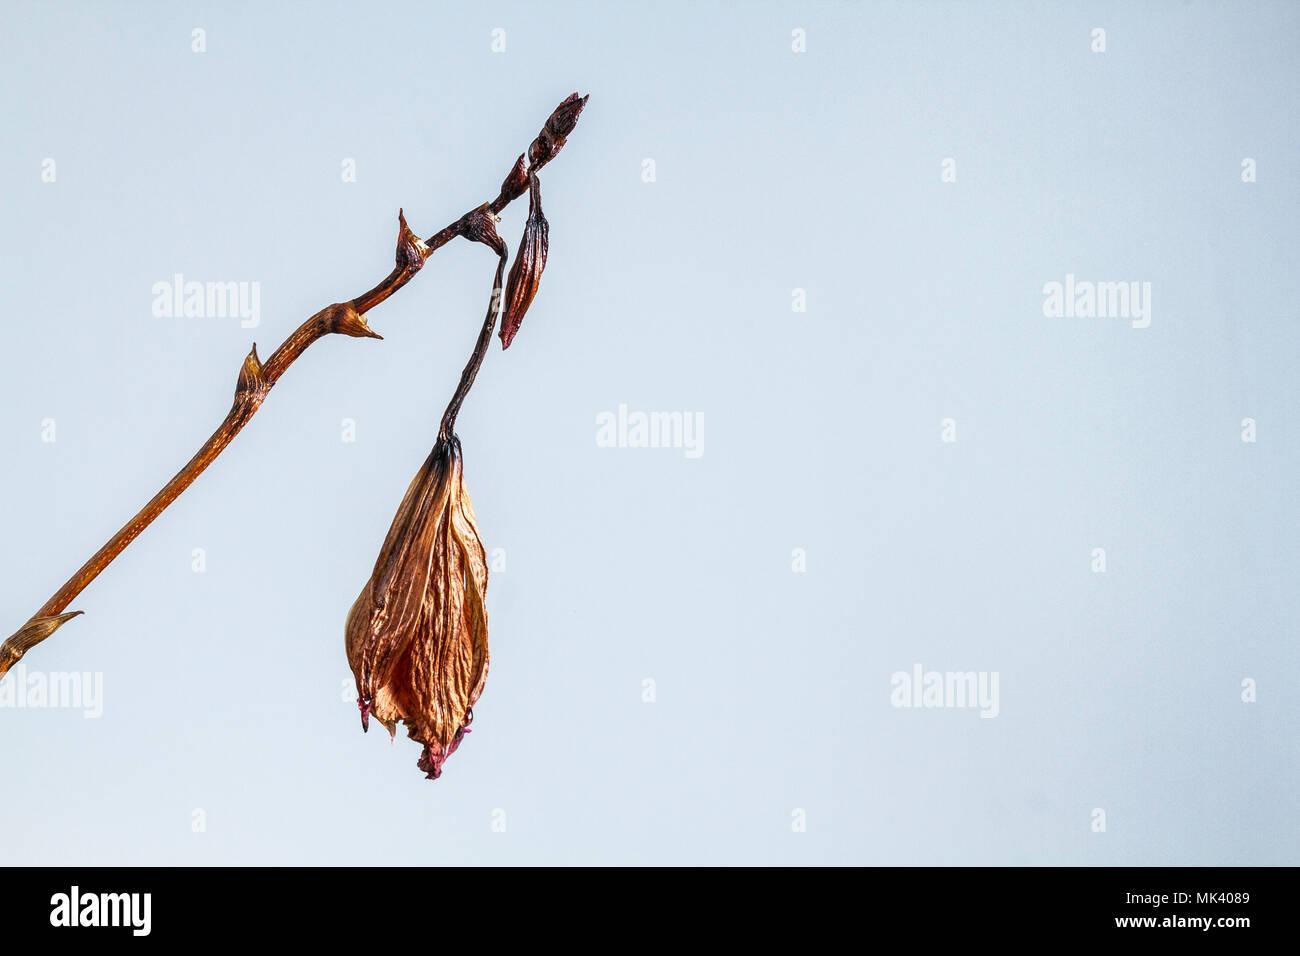 Morendo bamboo orchid (Arundina graminifolia). Immagini Stock